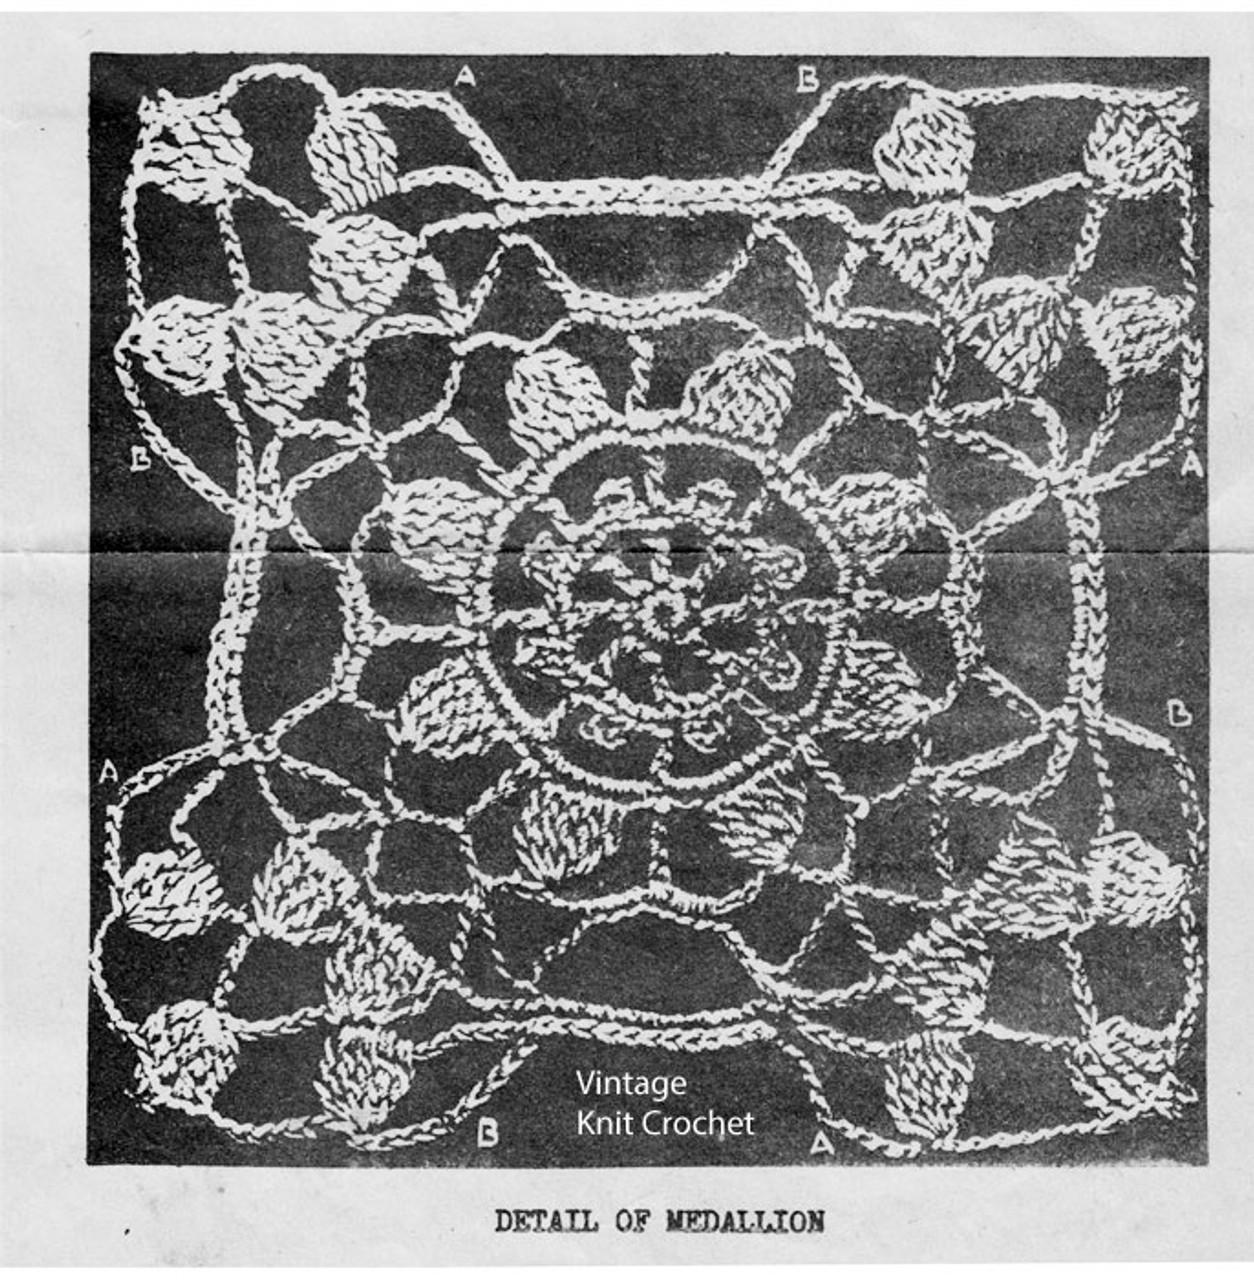 Vintage Lace Medallion Crochet Pattern No 5560